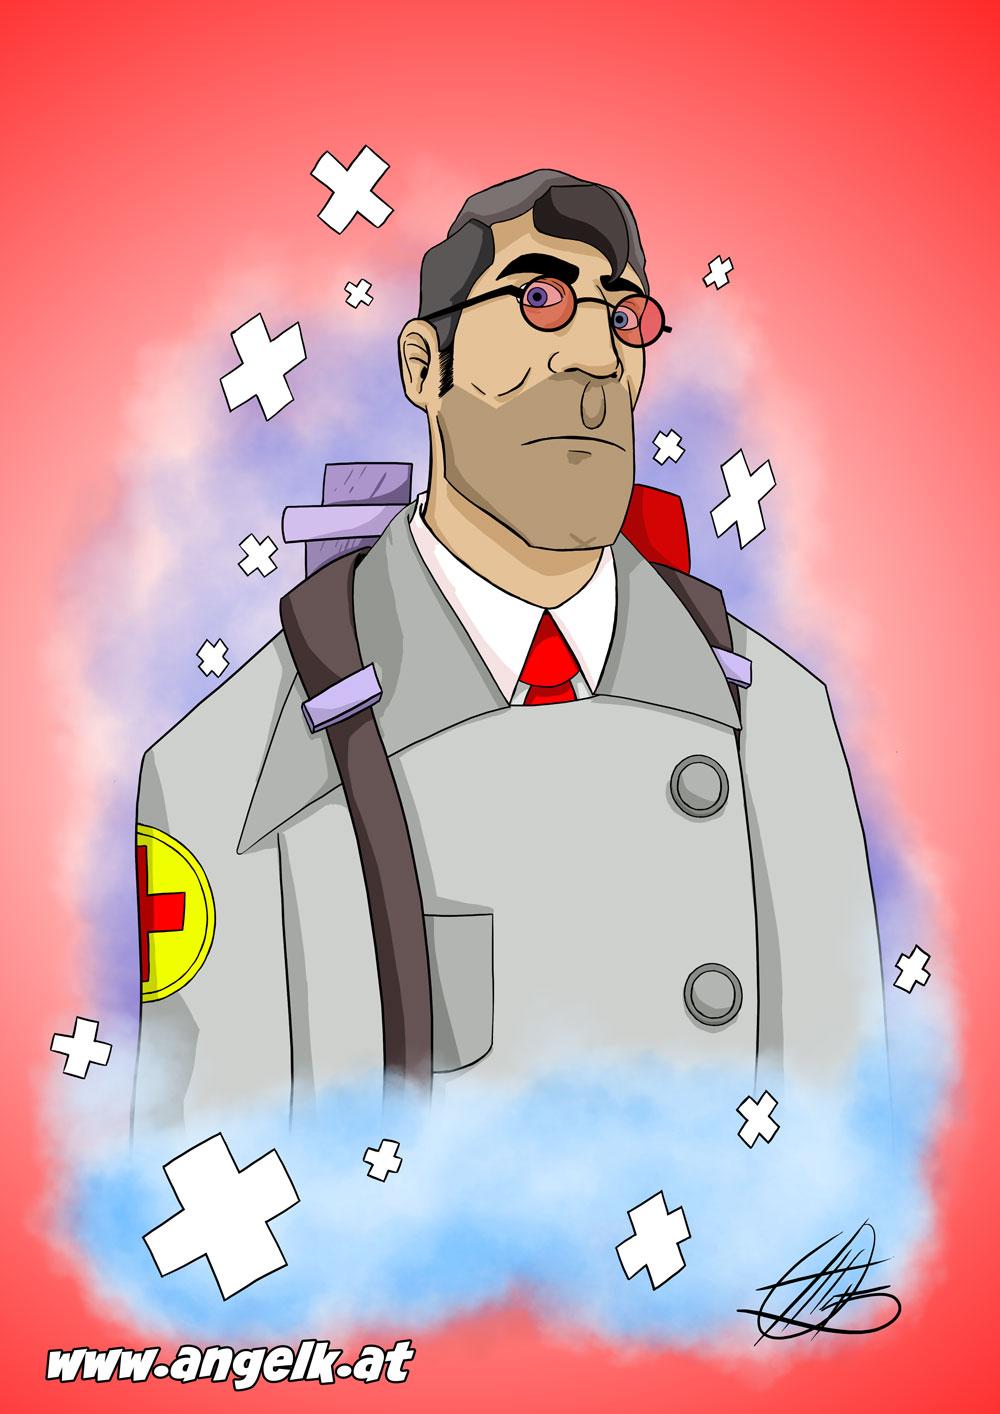 Red Medic